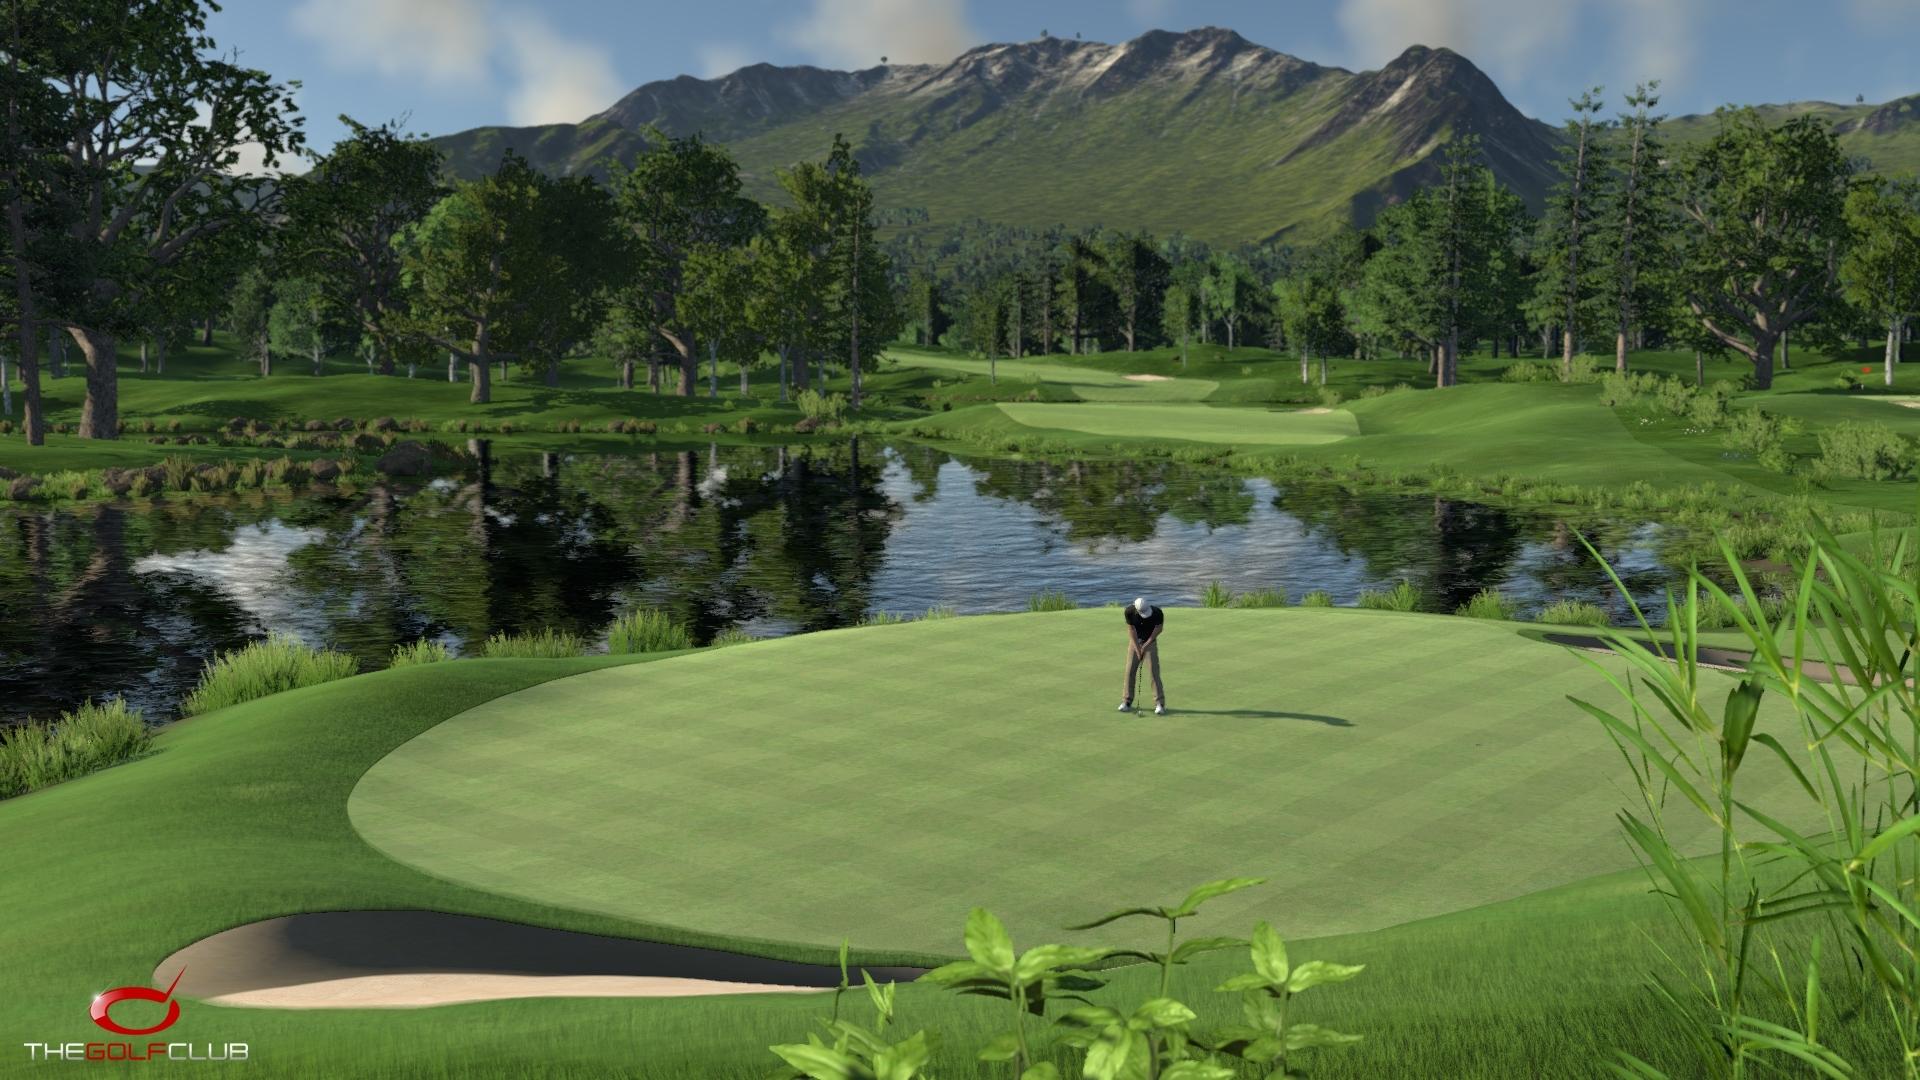 Download the Best 1080p Golf Wallpaper